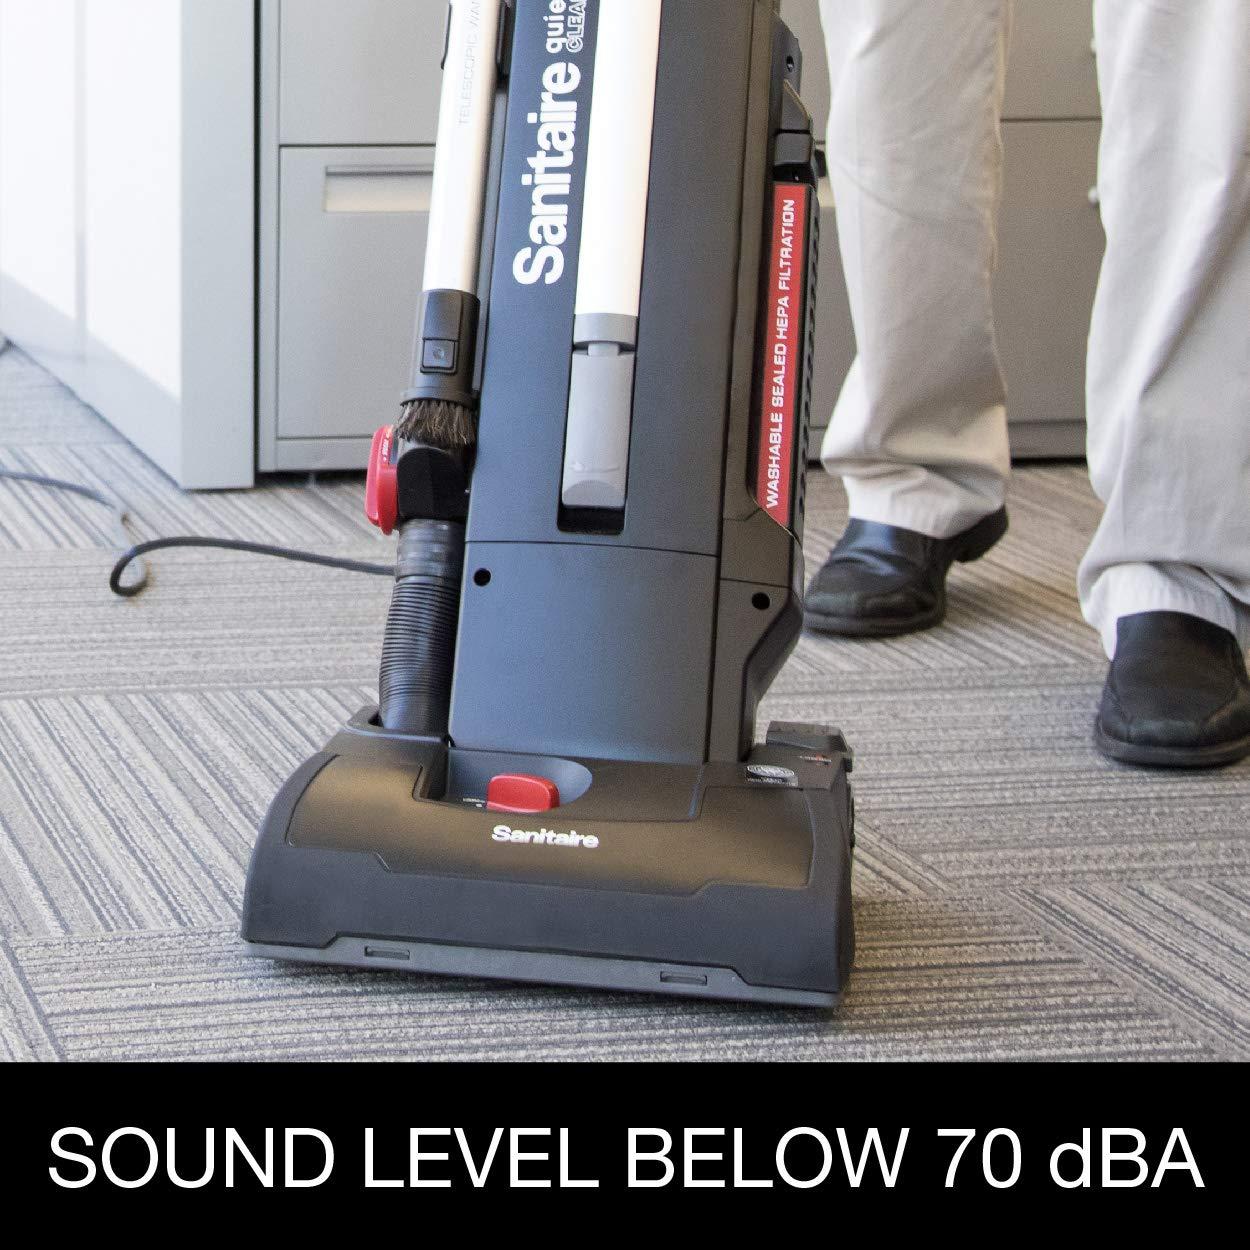 Sanitaire Multi-Surface Commercial Vacuum